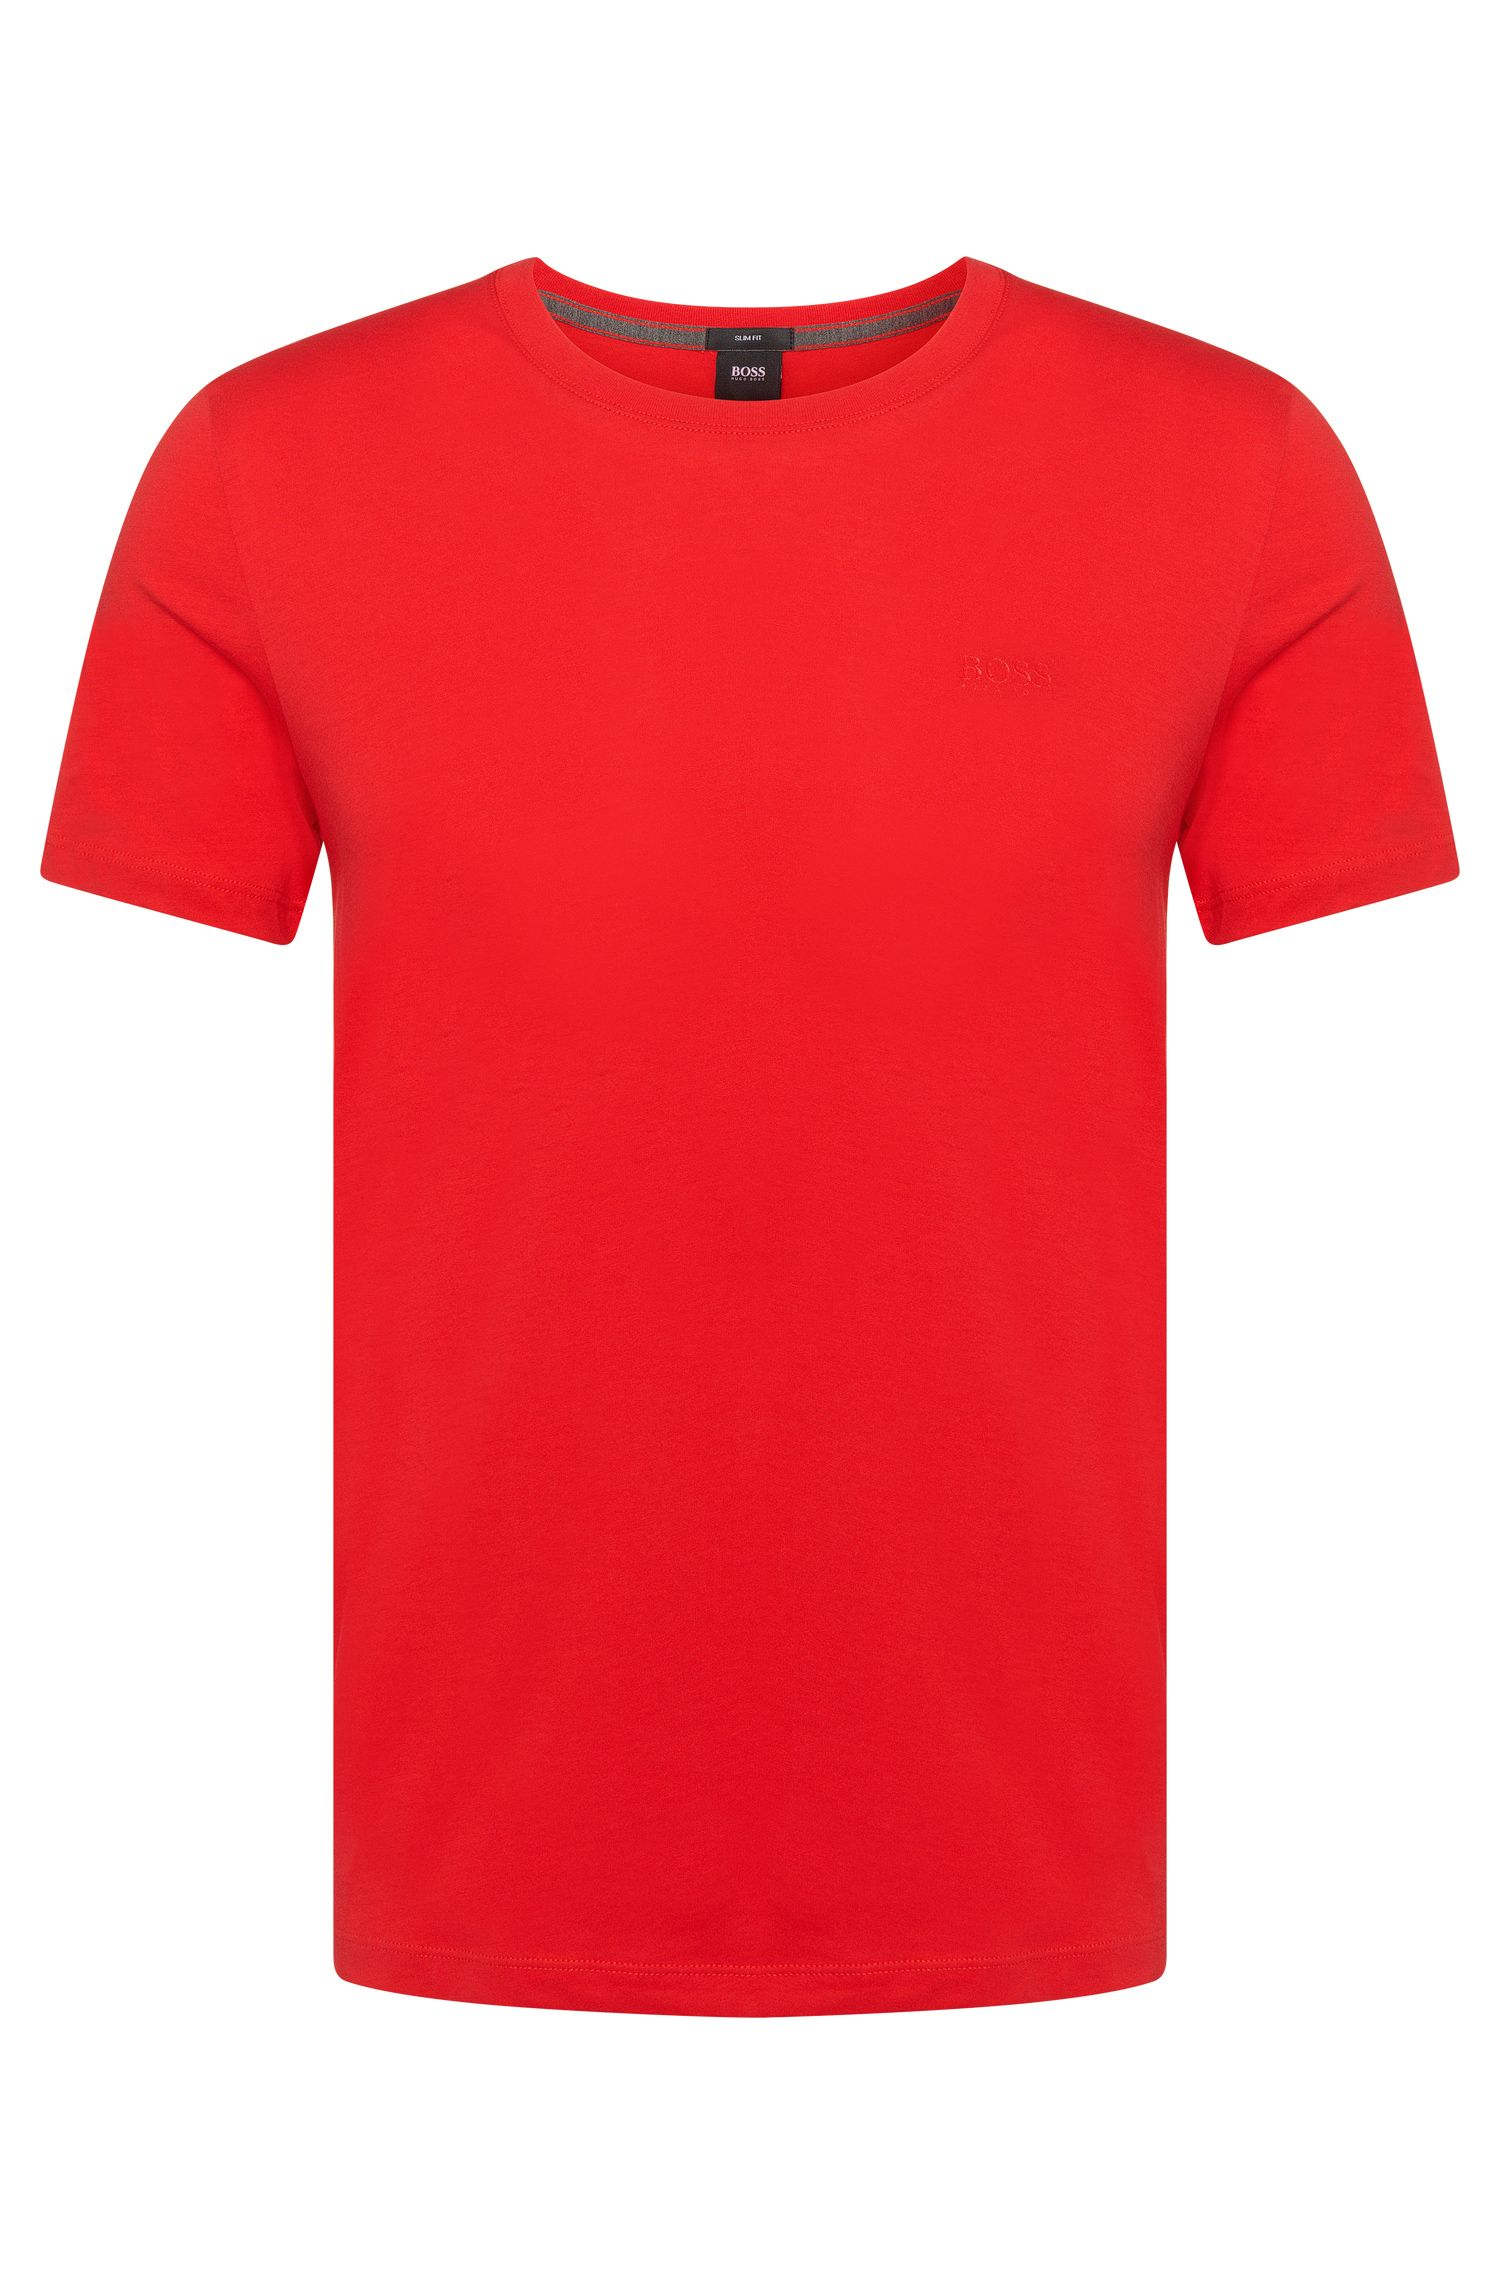 T-shirt Slim Fit en coton: «Tessler33»